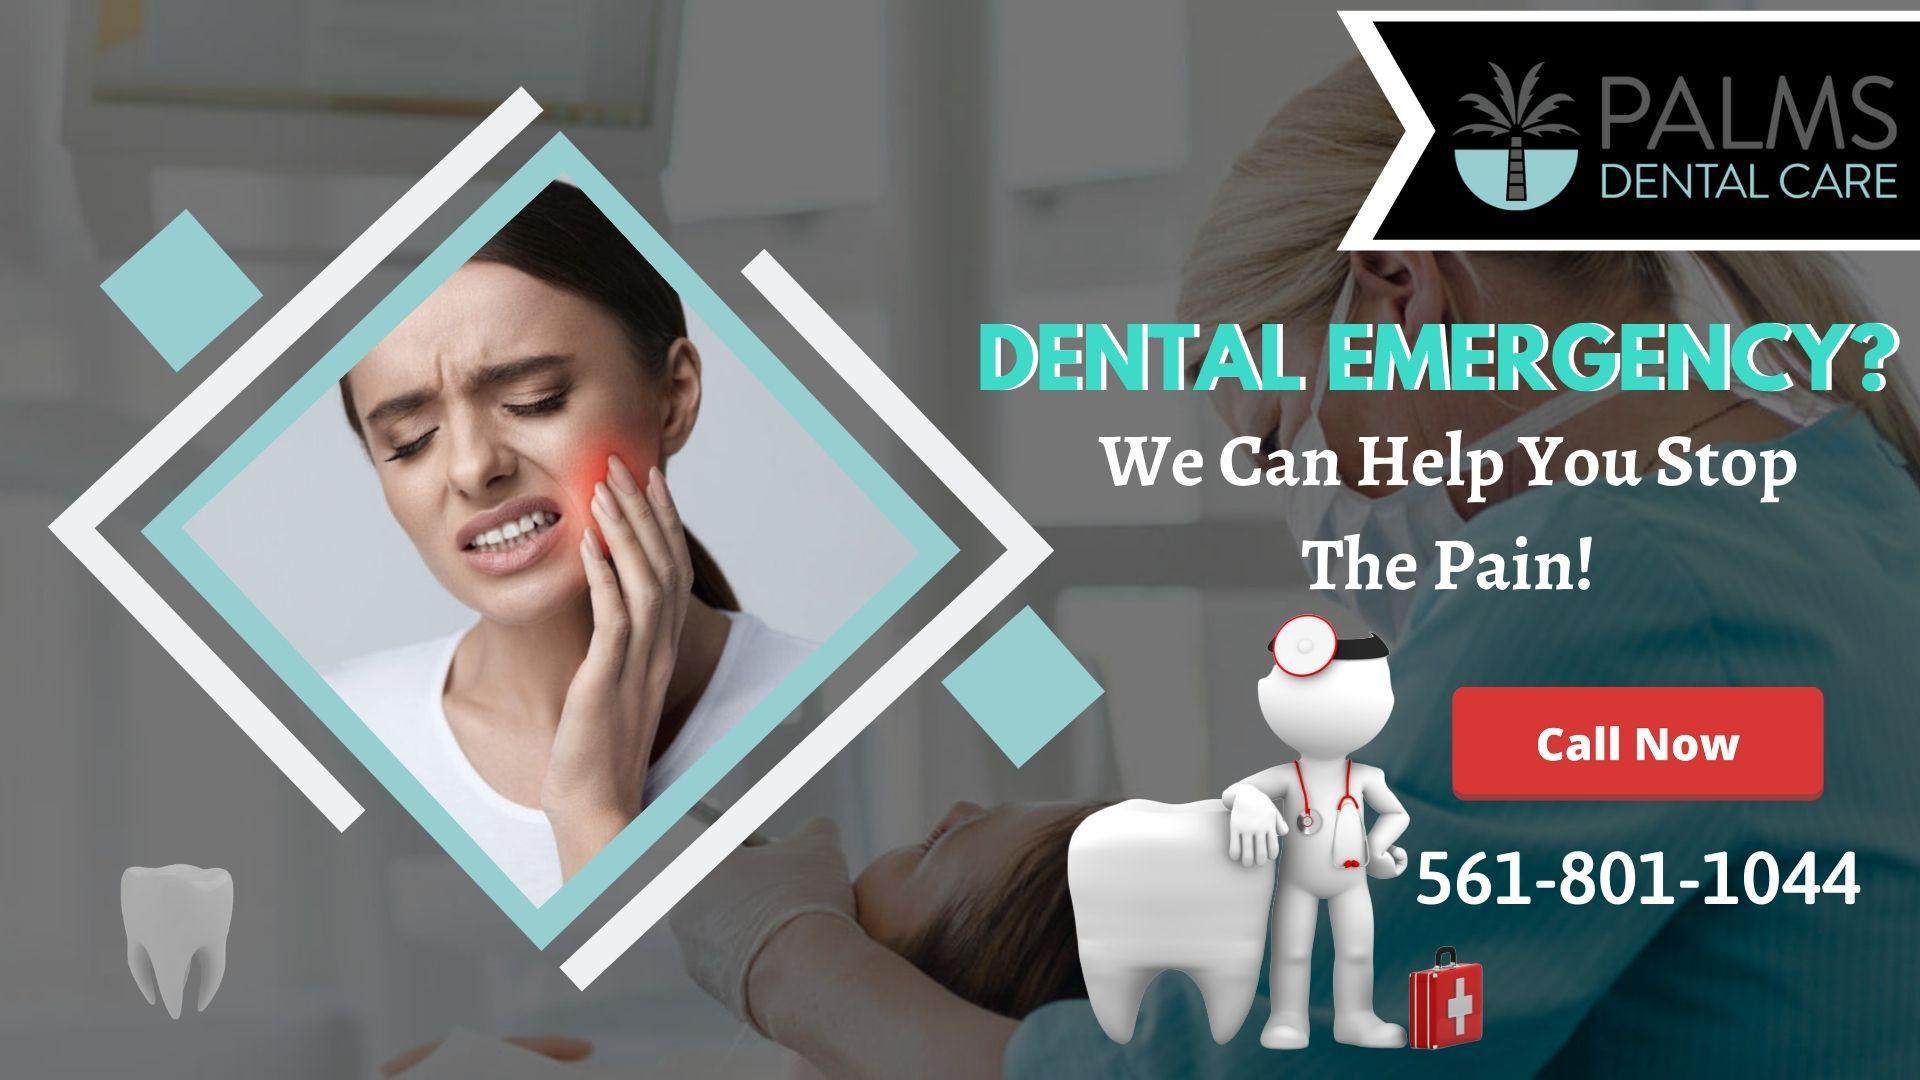 Explore Emergency WalkIn Dentist Services in 2020